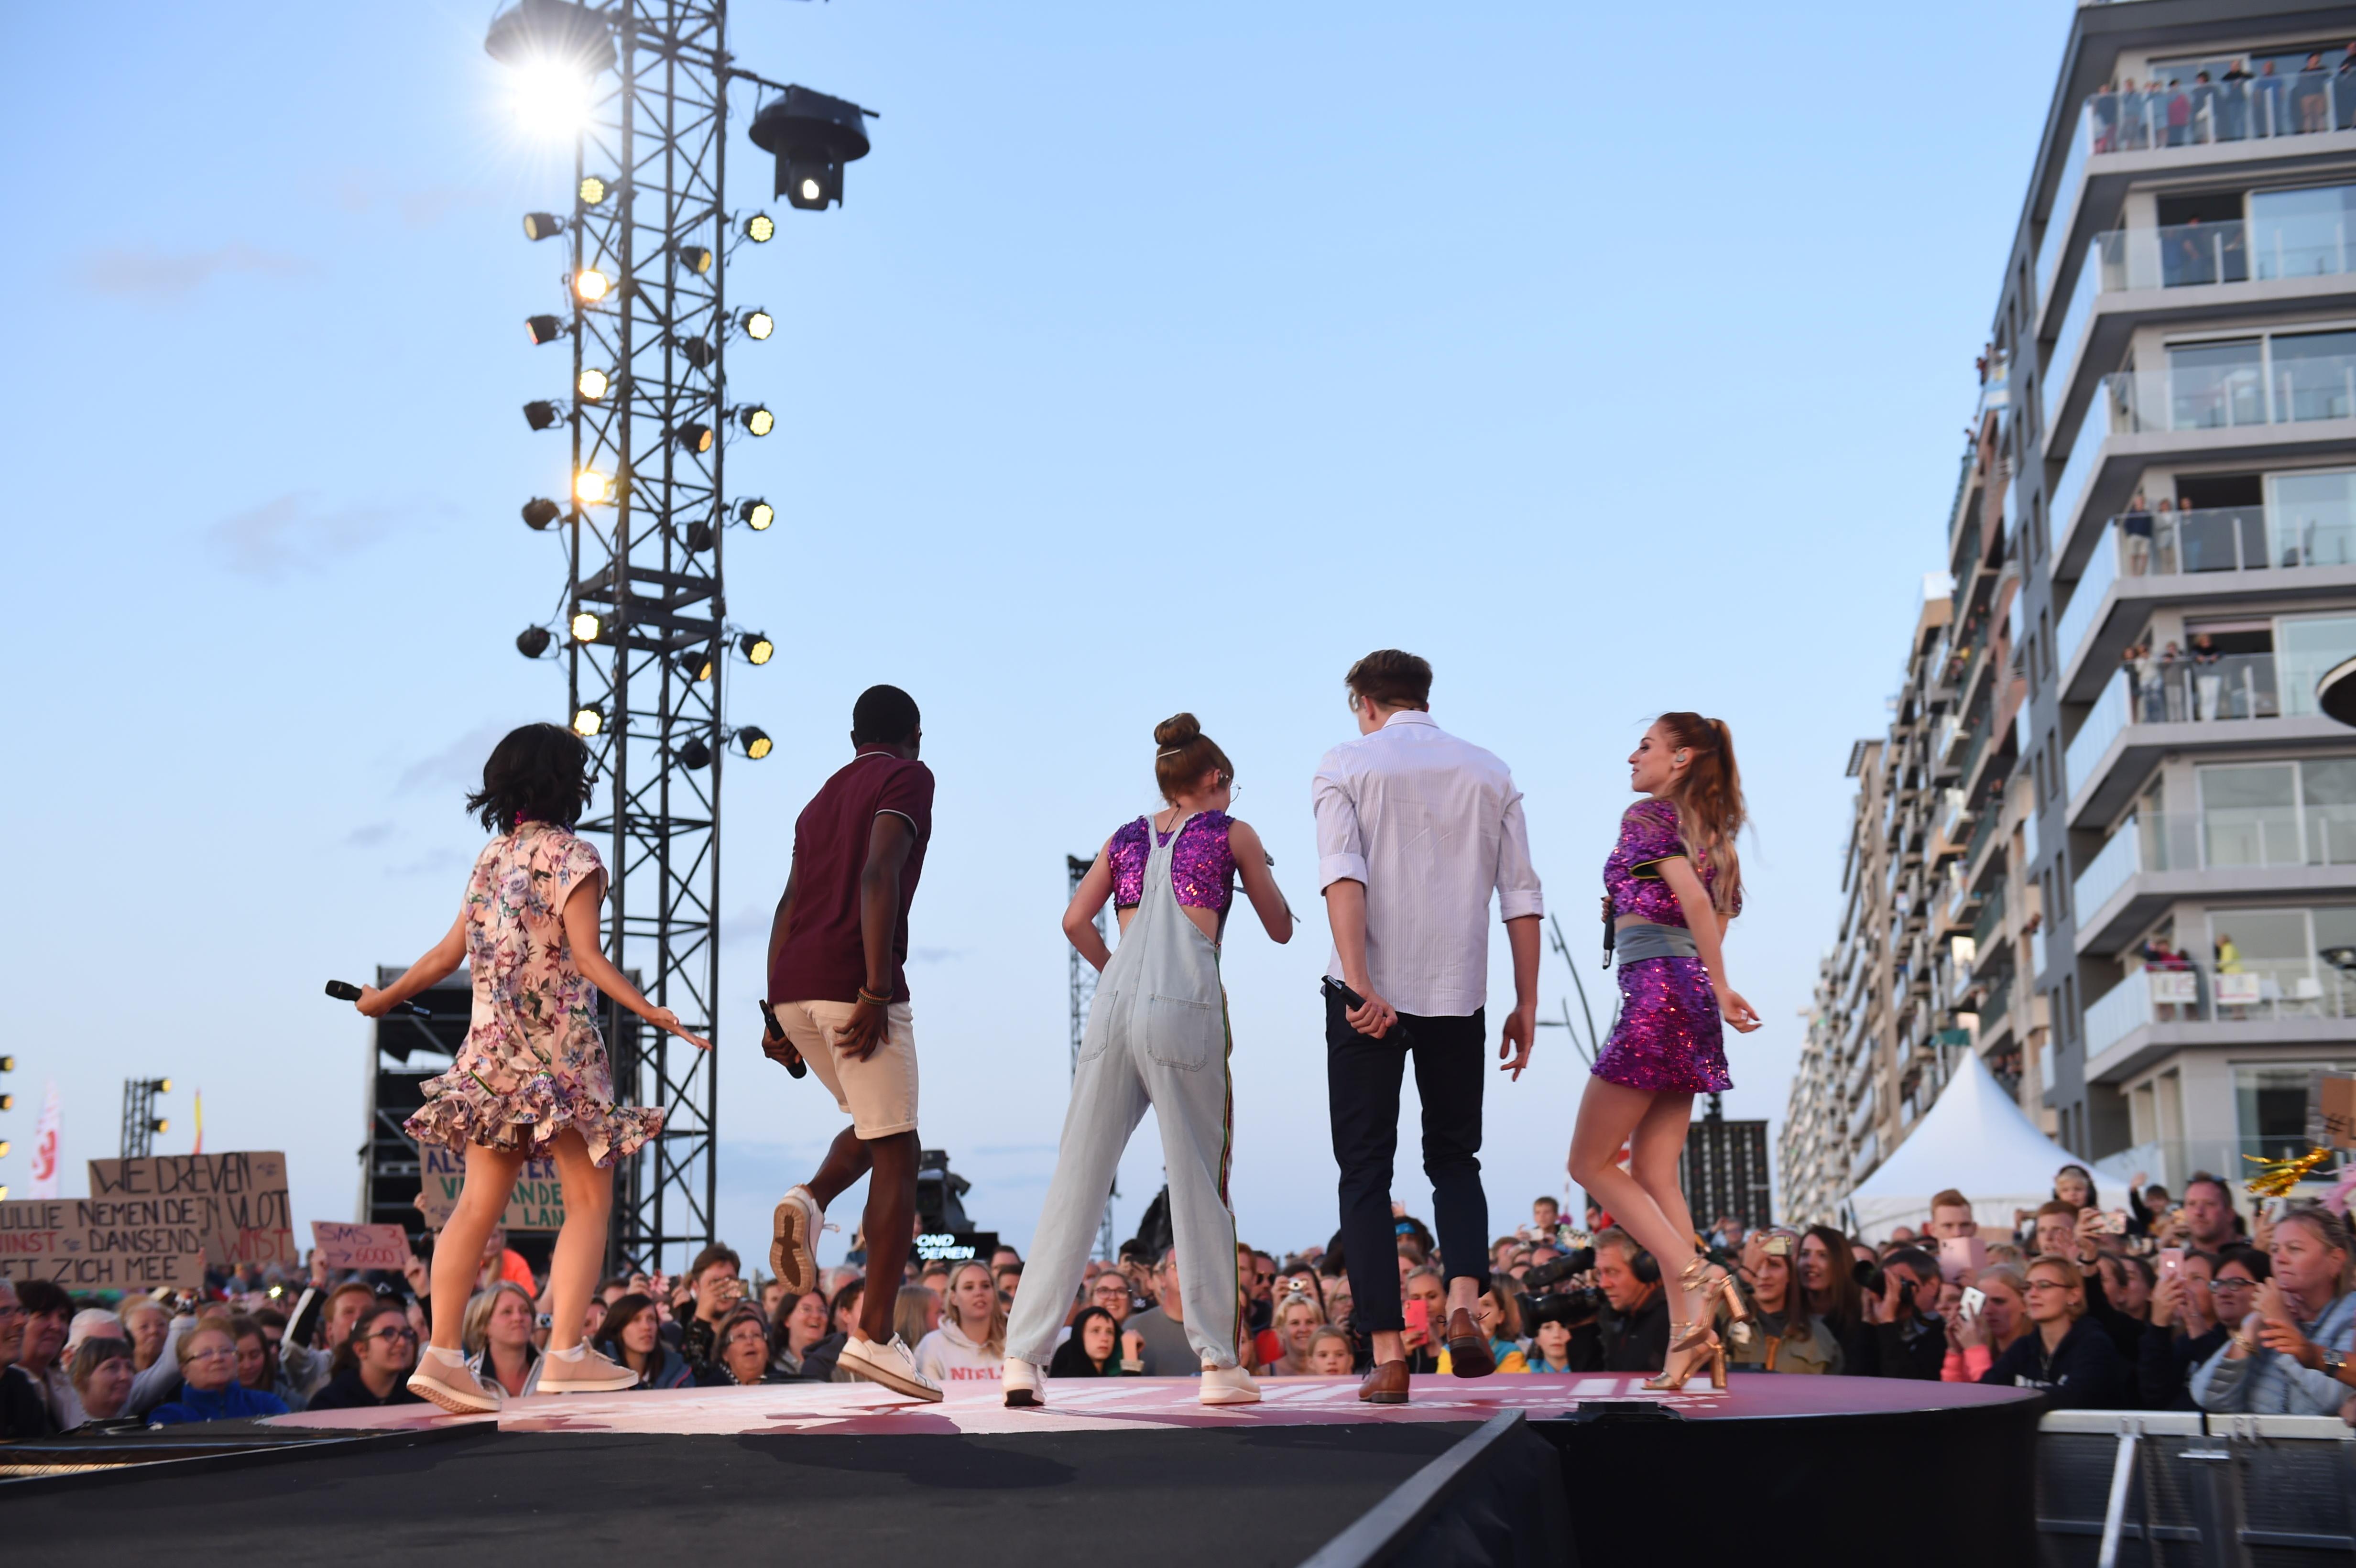 #LikeMe trad op met hun nummer 'Vlaanderen m'n land'